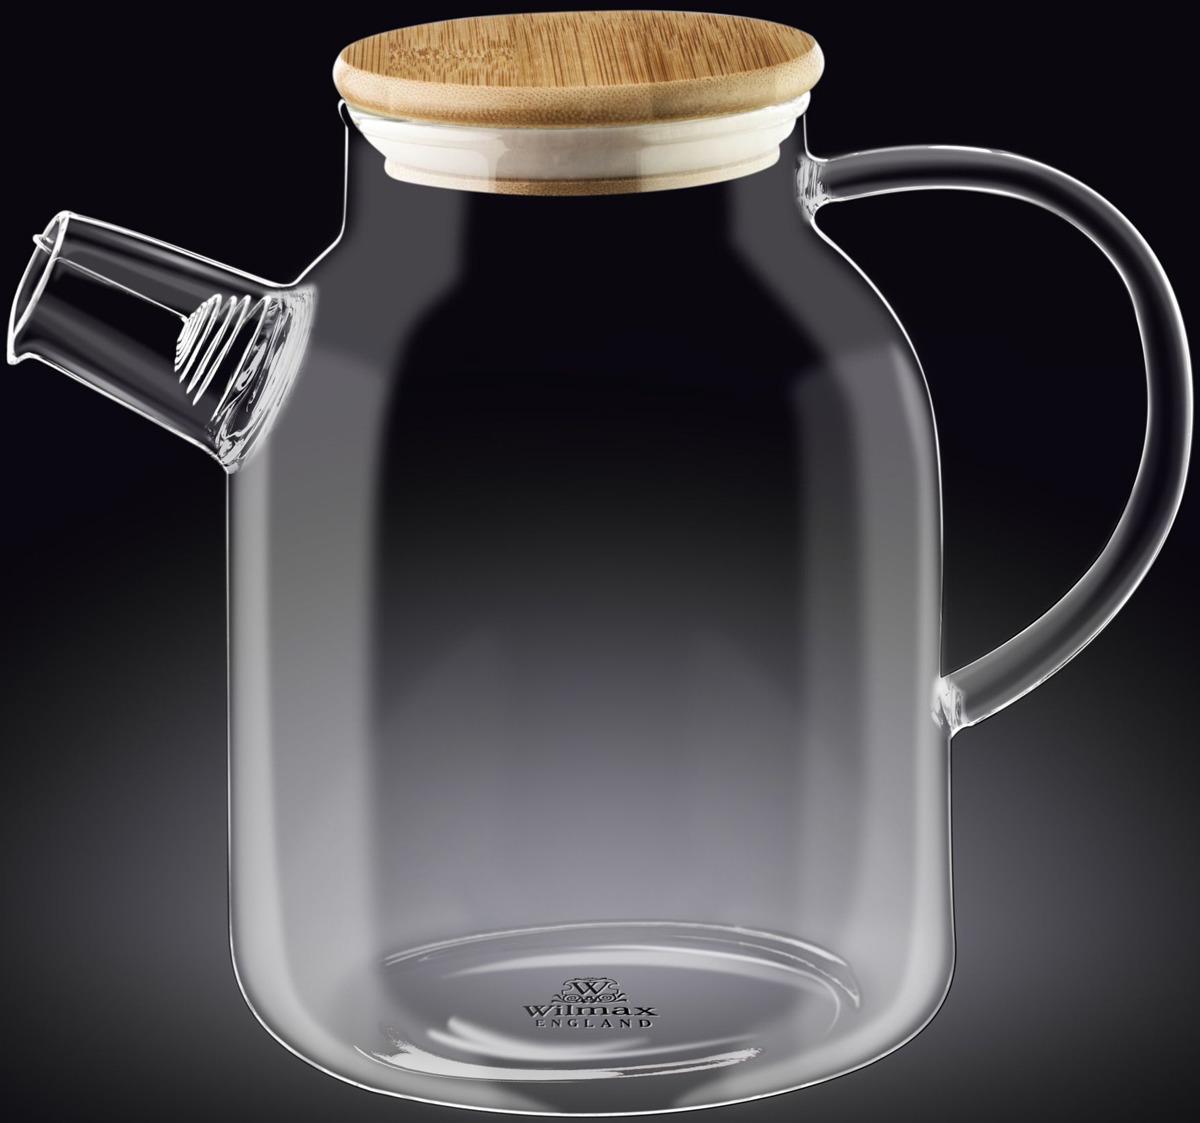 Чайник заварочный Wilmax, WL-888811 / A, 1,6 л чайник заварочный wilmax 1 15 л wl 994000